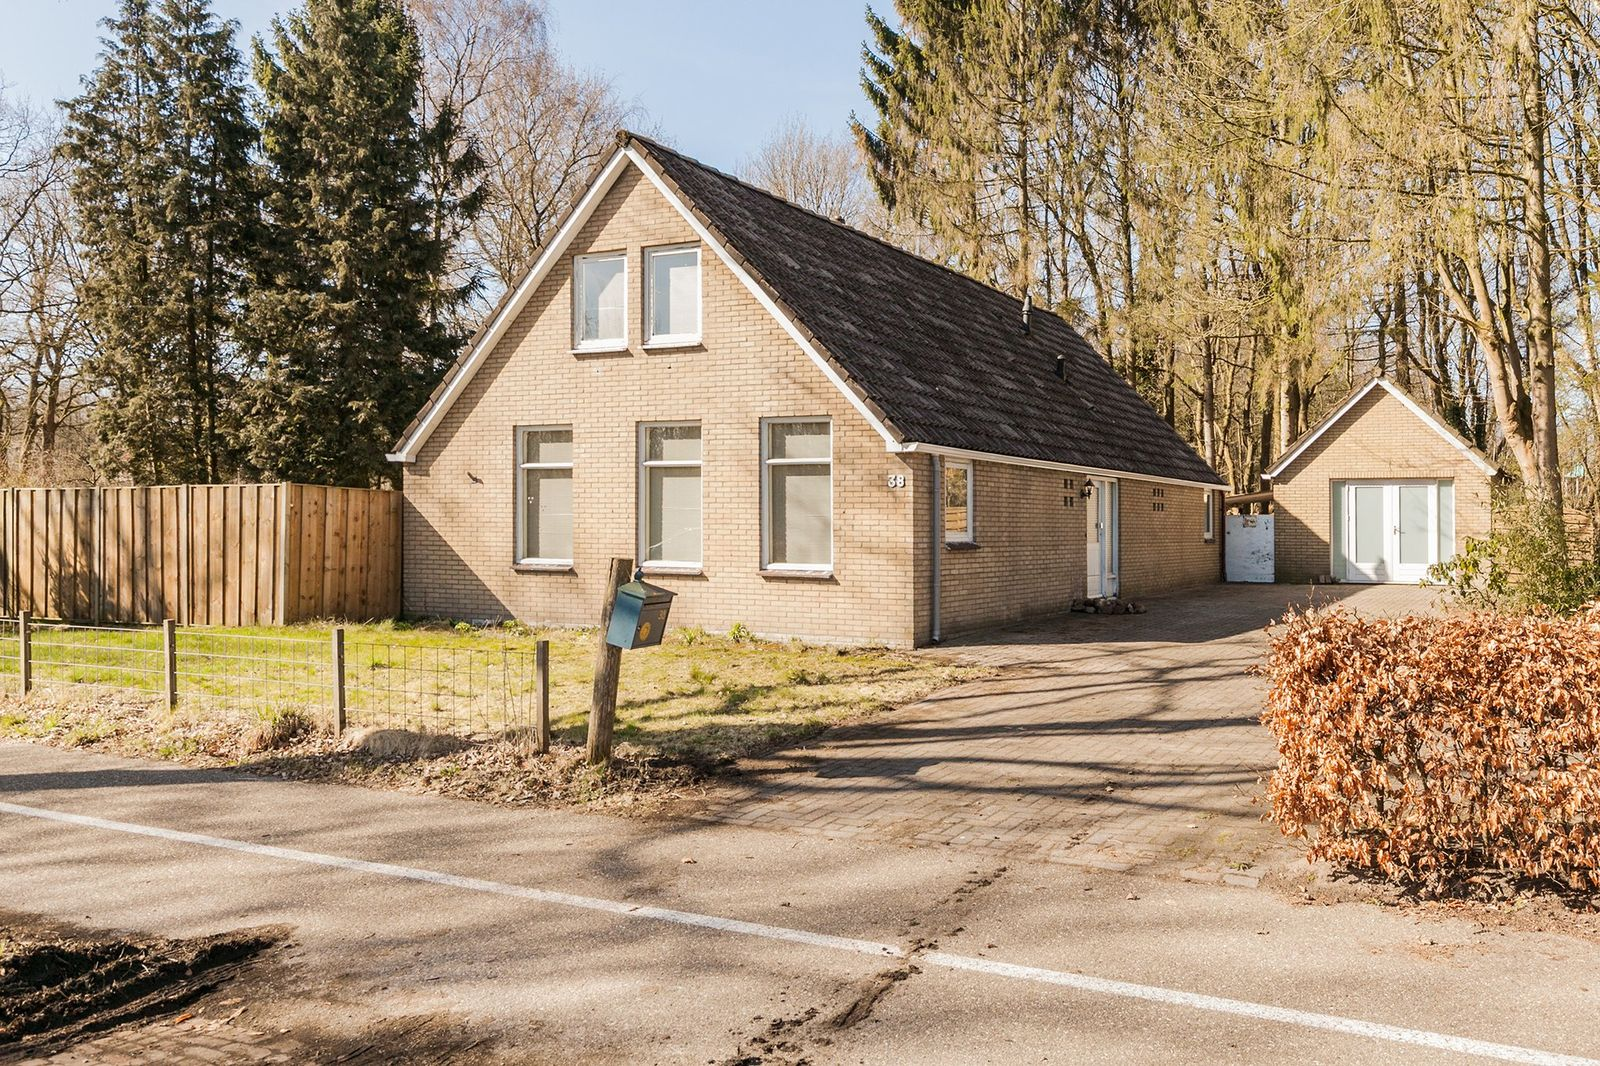 Valtherweg 38, Exloo